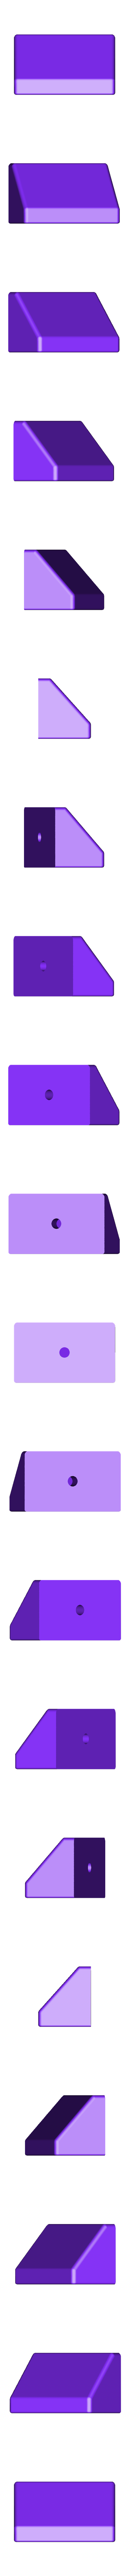 Drawer Knob.STL Download STL file Ender 3 Pro Storage Mod Kit • Object to 3D print, a3rdDimension